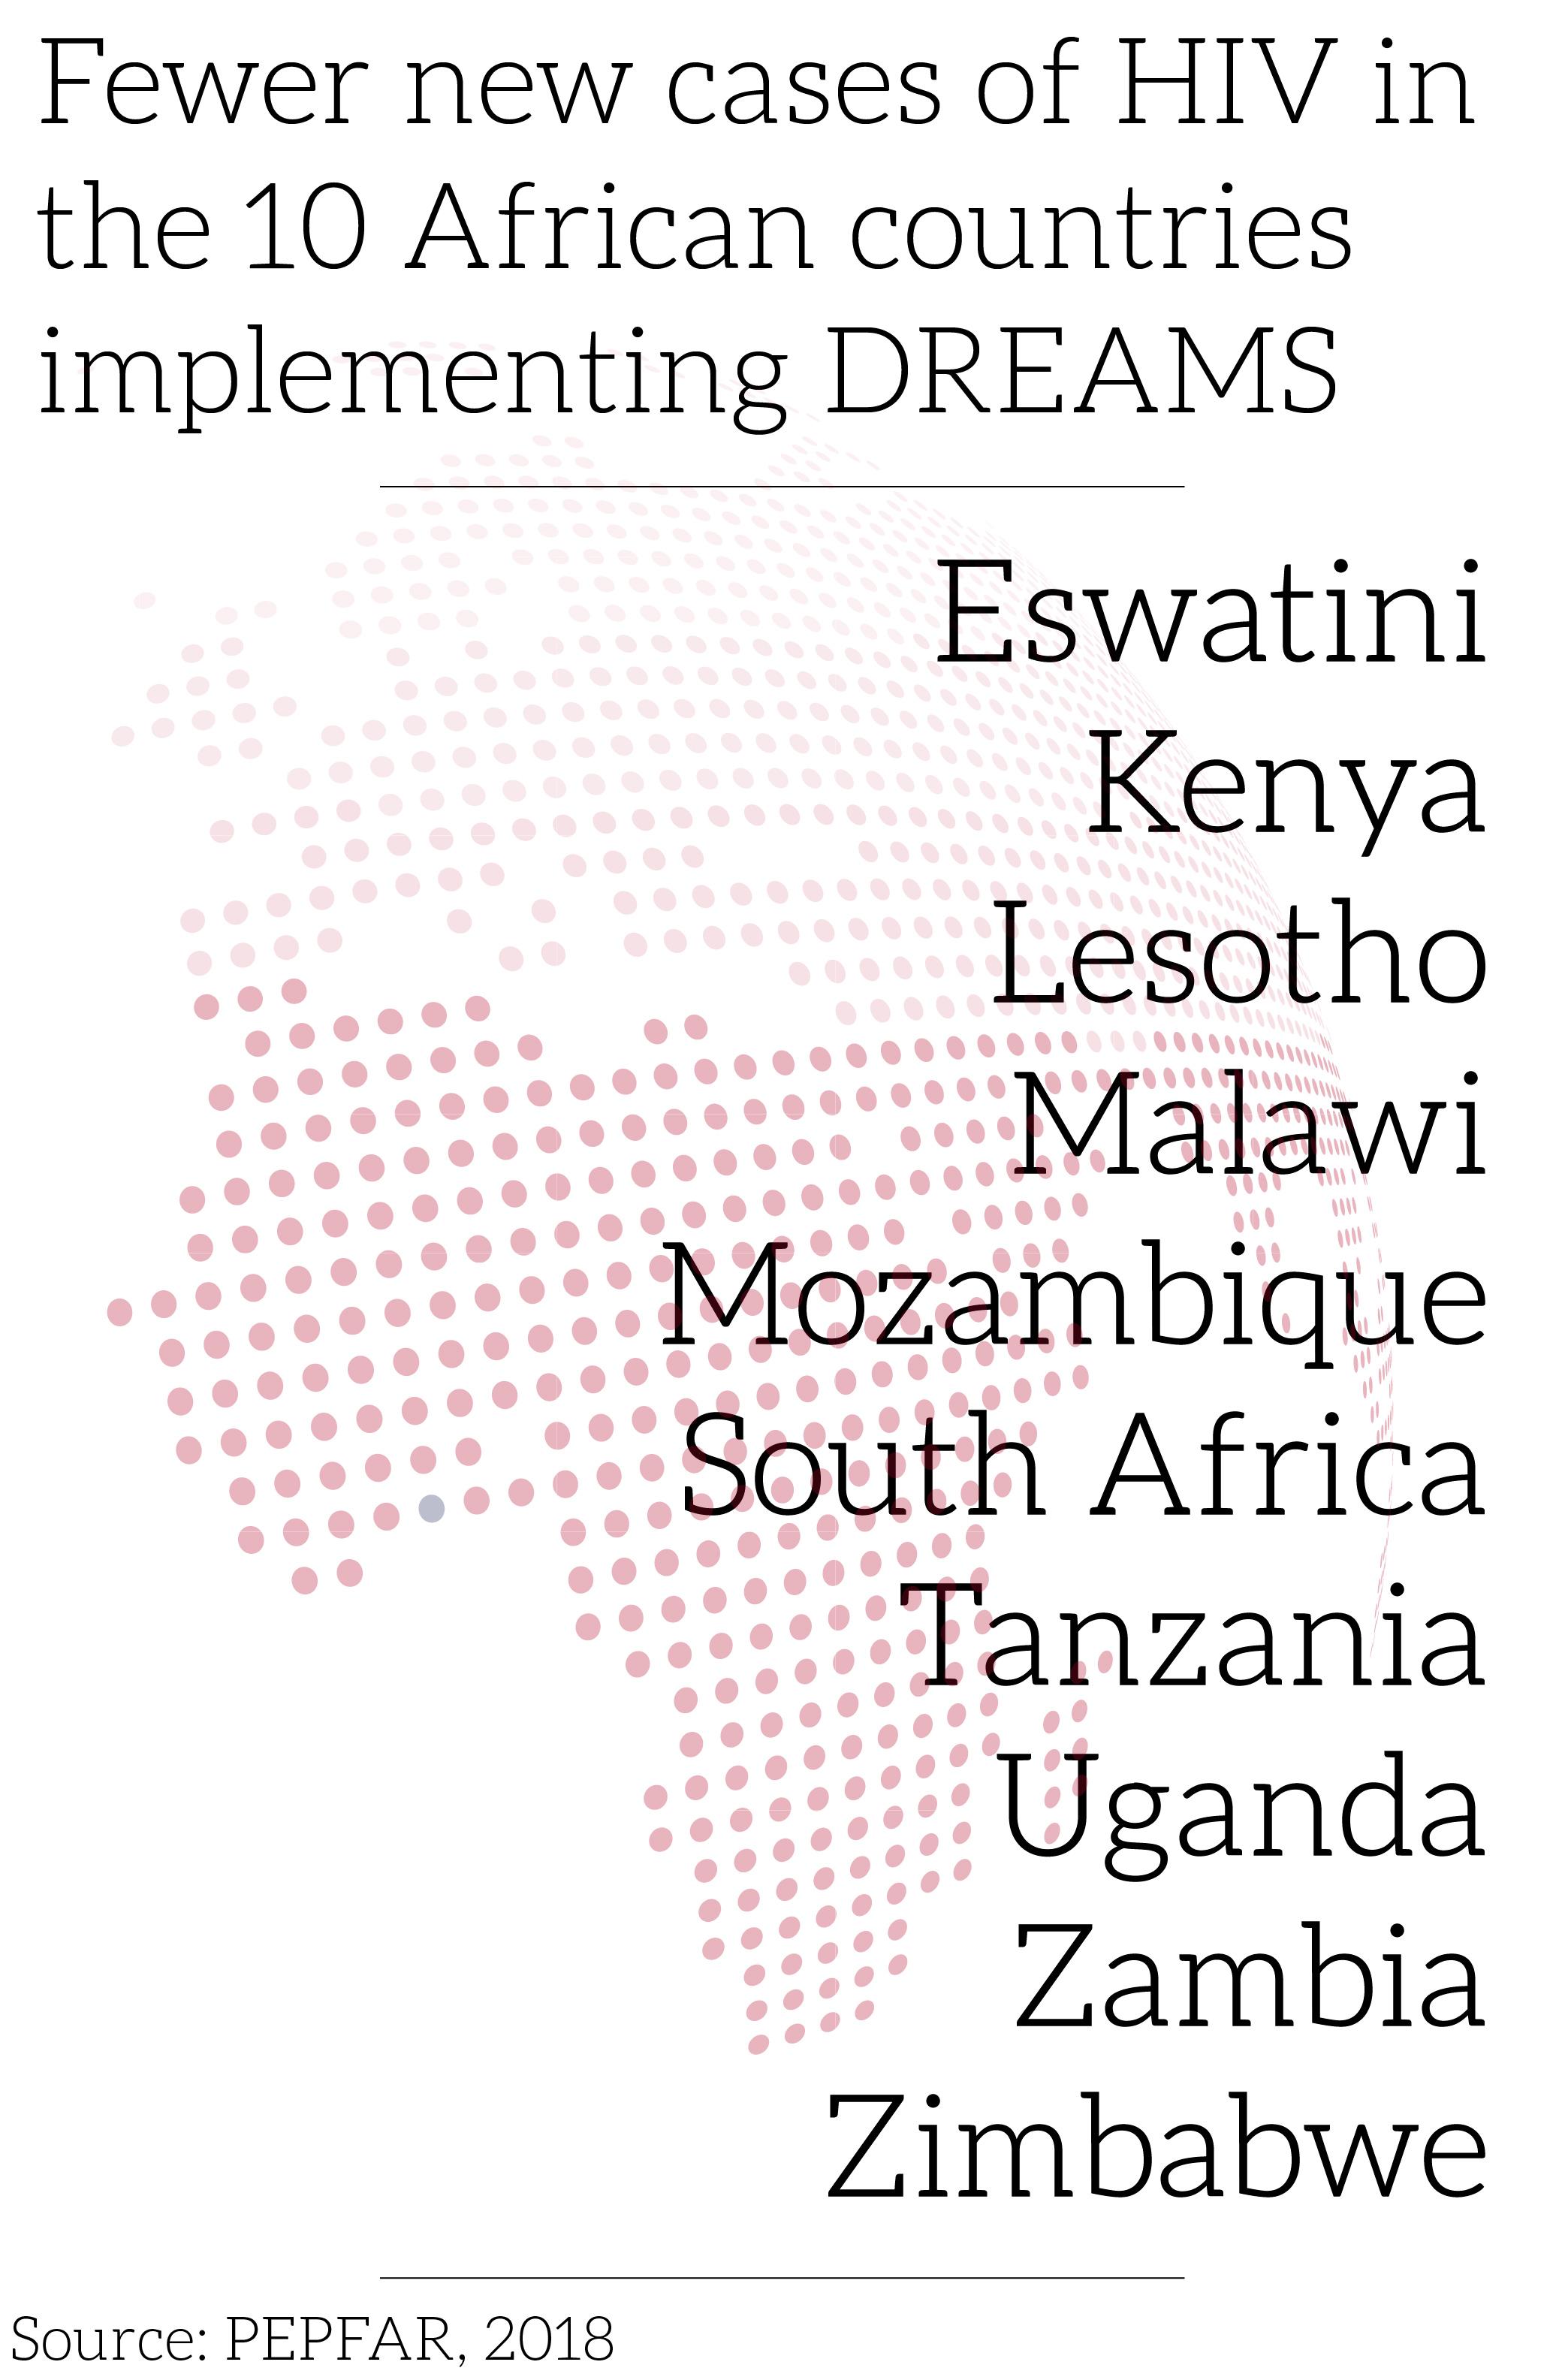 85 percent decline in HIV diagnoses in 10 DREAMS countries (PEPFAR, 2018)